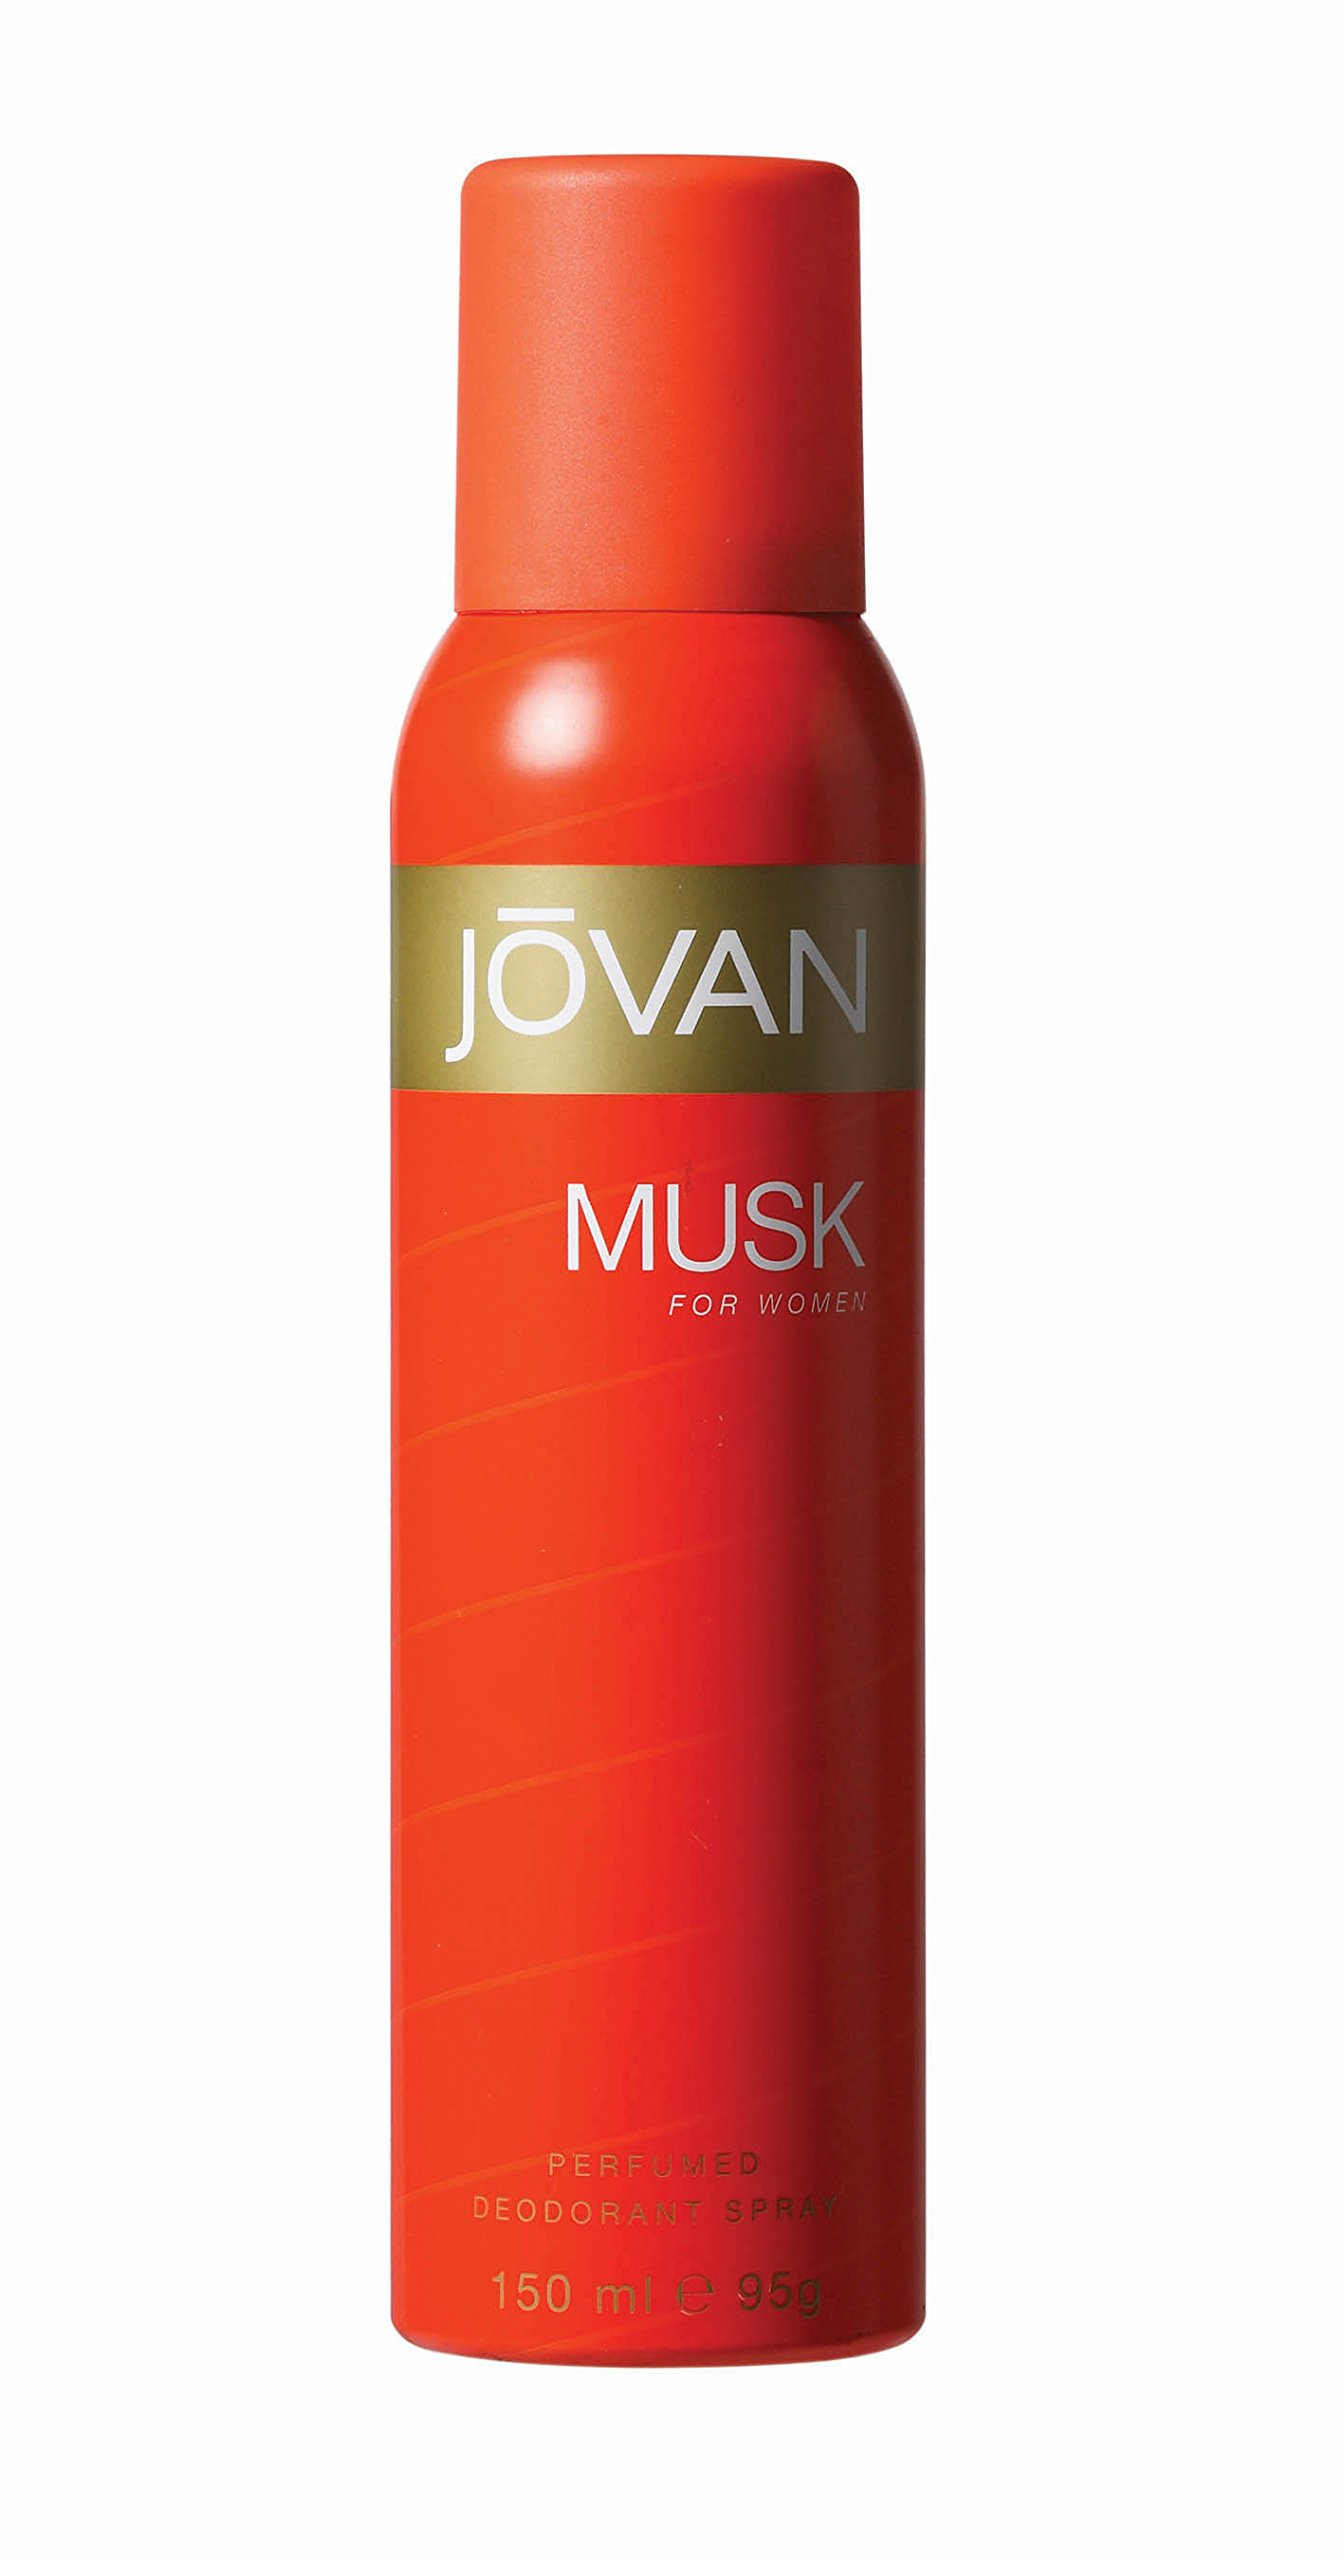 Jovan Deodorant Spray for Women, Musk, 5 Ounce